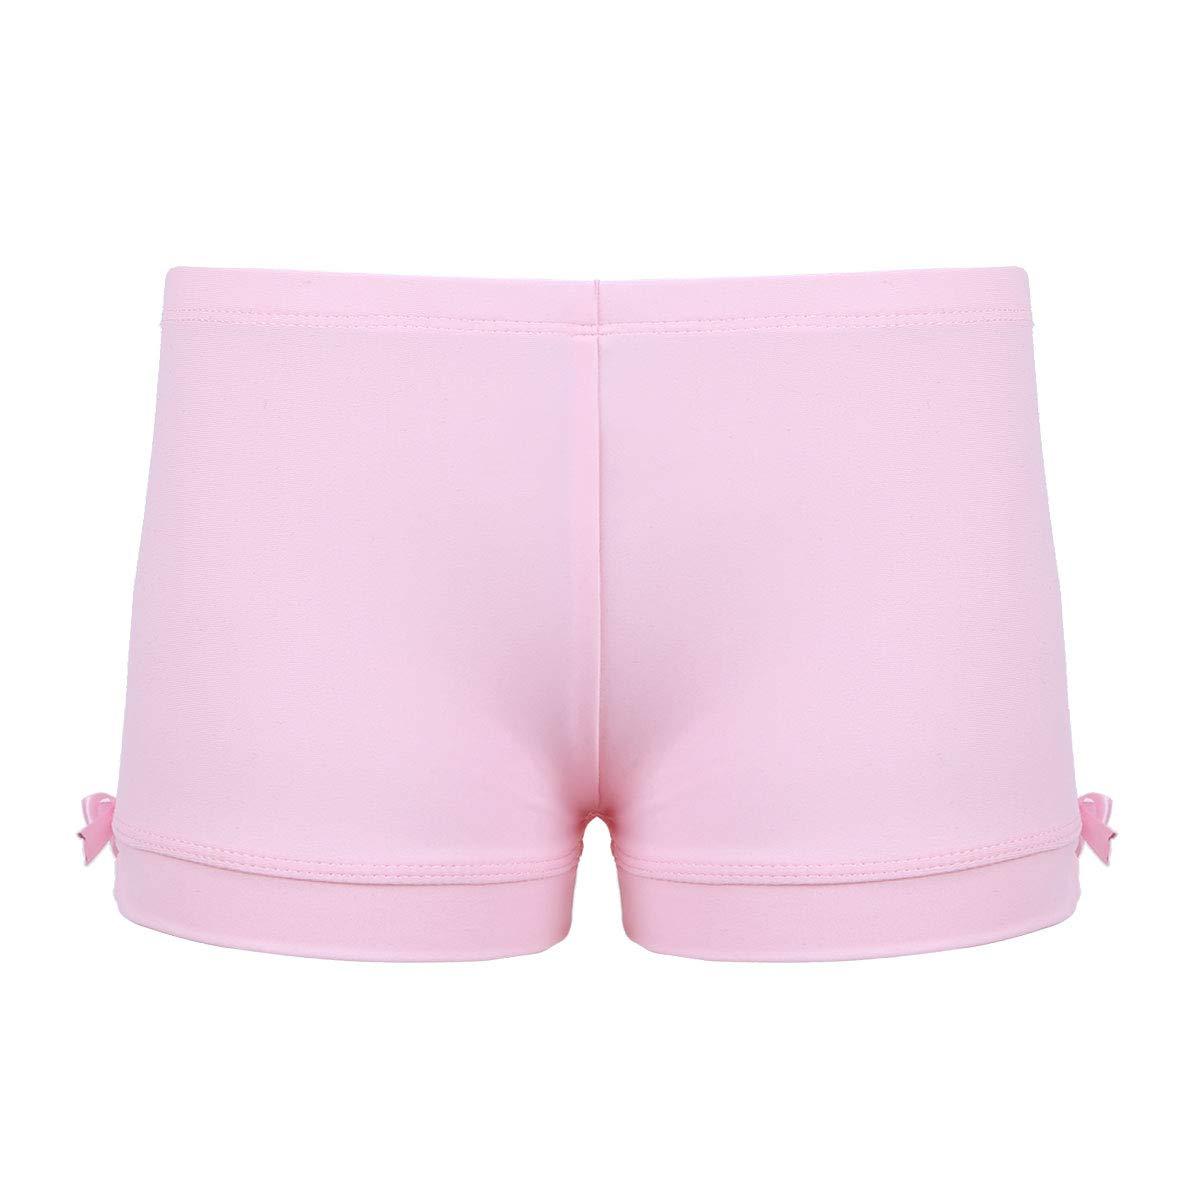 Agoky Kids Girls Gymnastics Workout Yoga Athletic Sports Training Bike Short Pink Boy-Cut 3 by Agoky (Image #2)